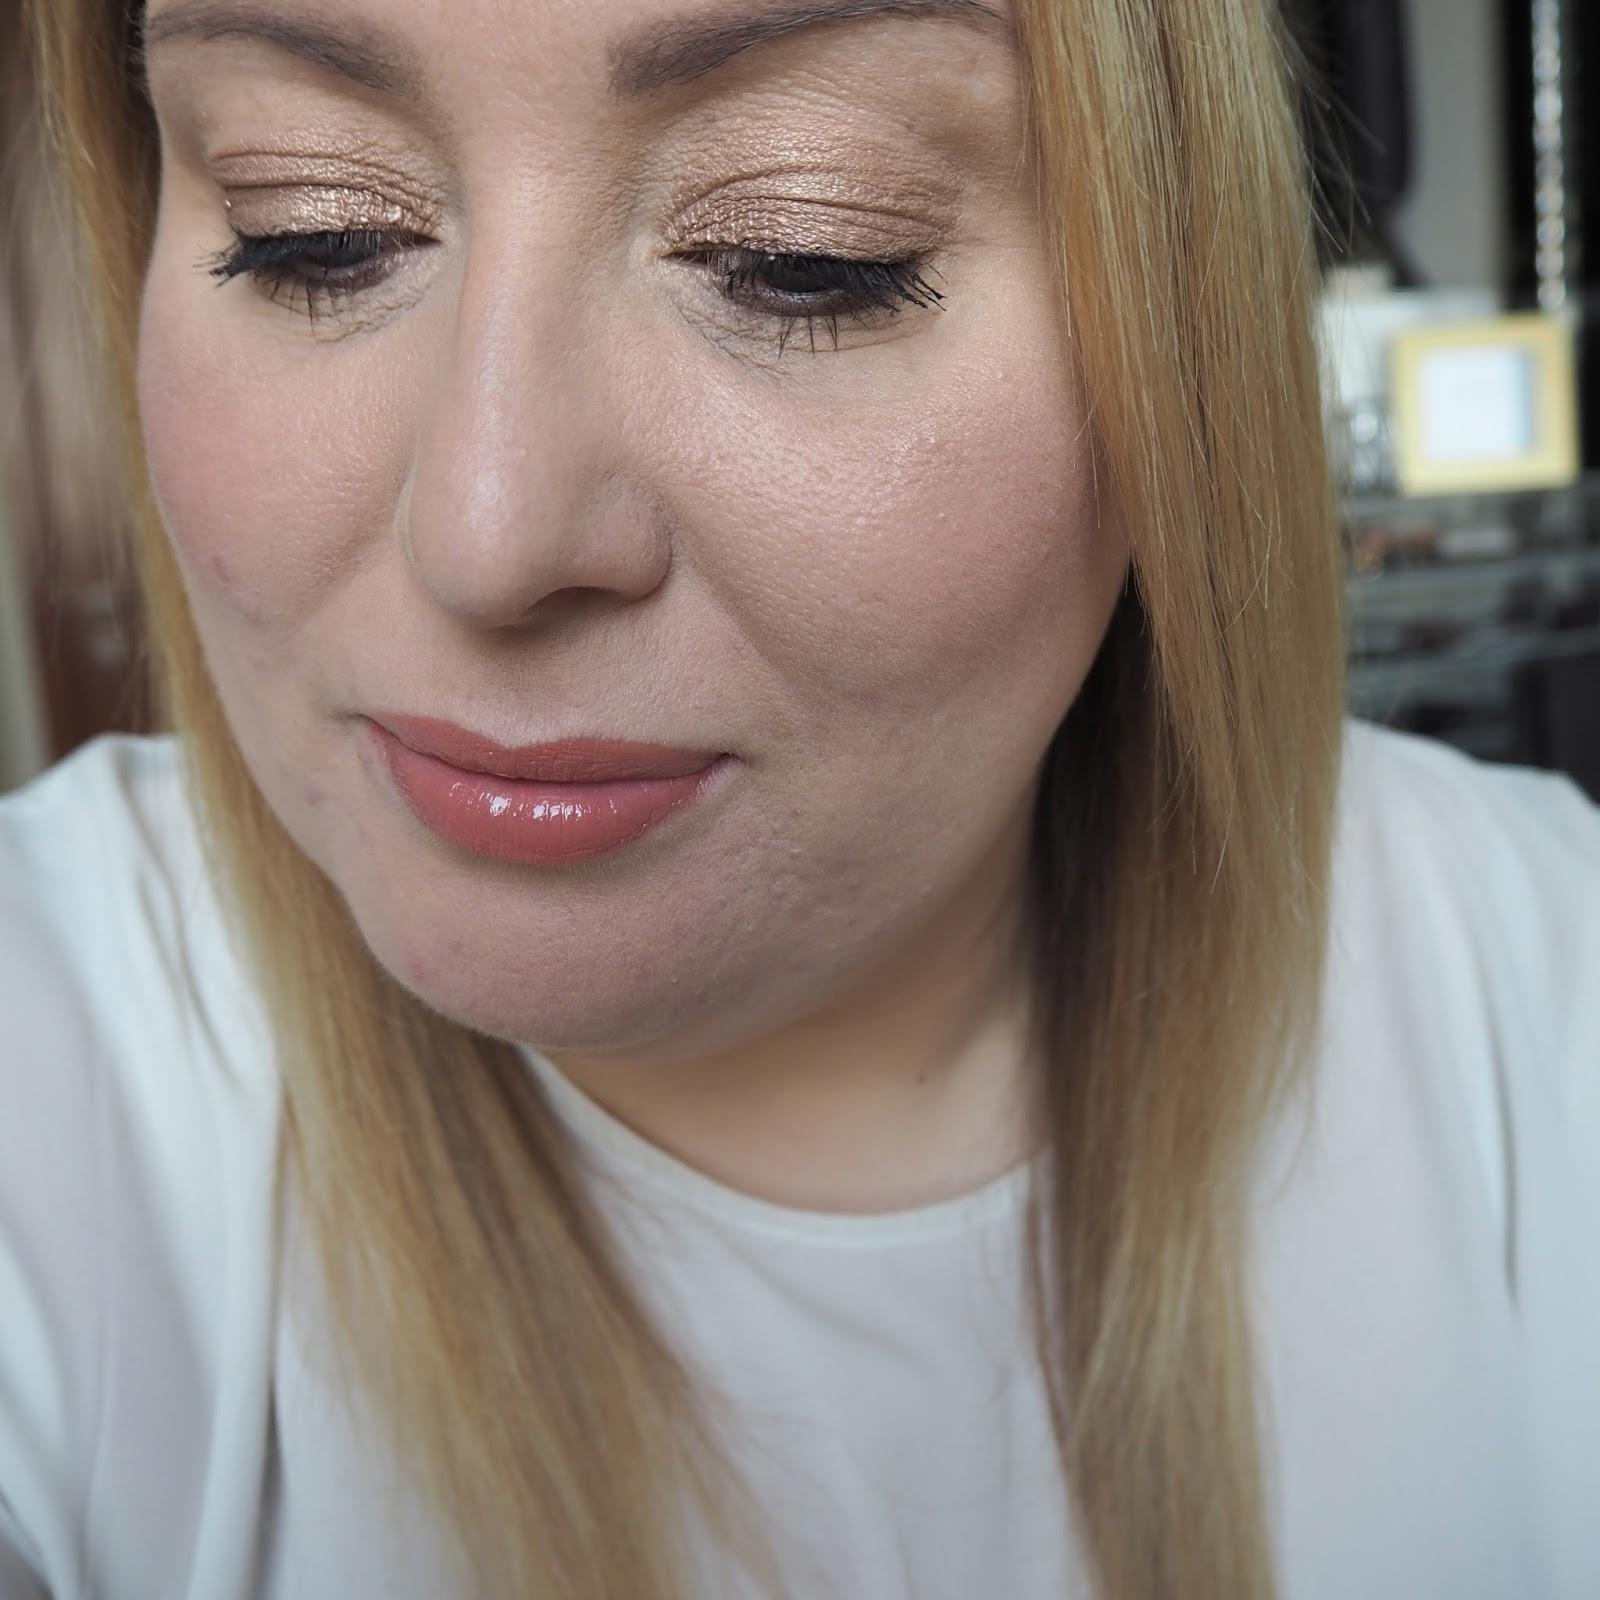 Tarte Tarteist Glossy Lip Paint in Goals